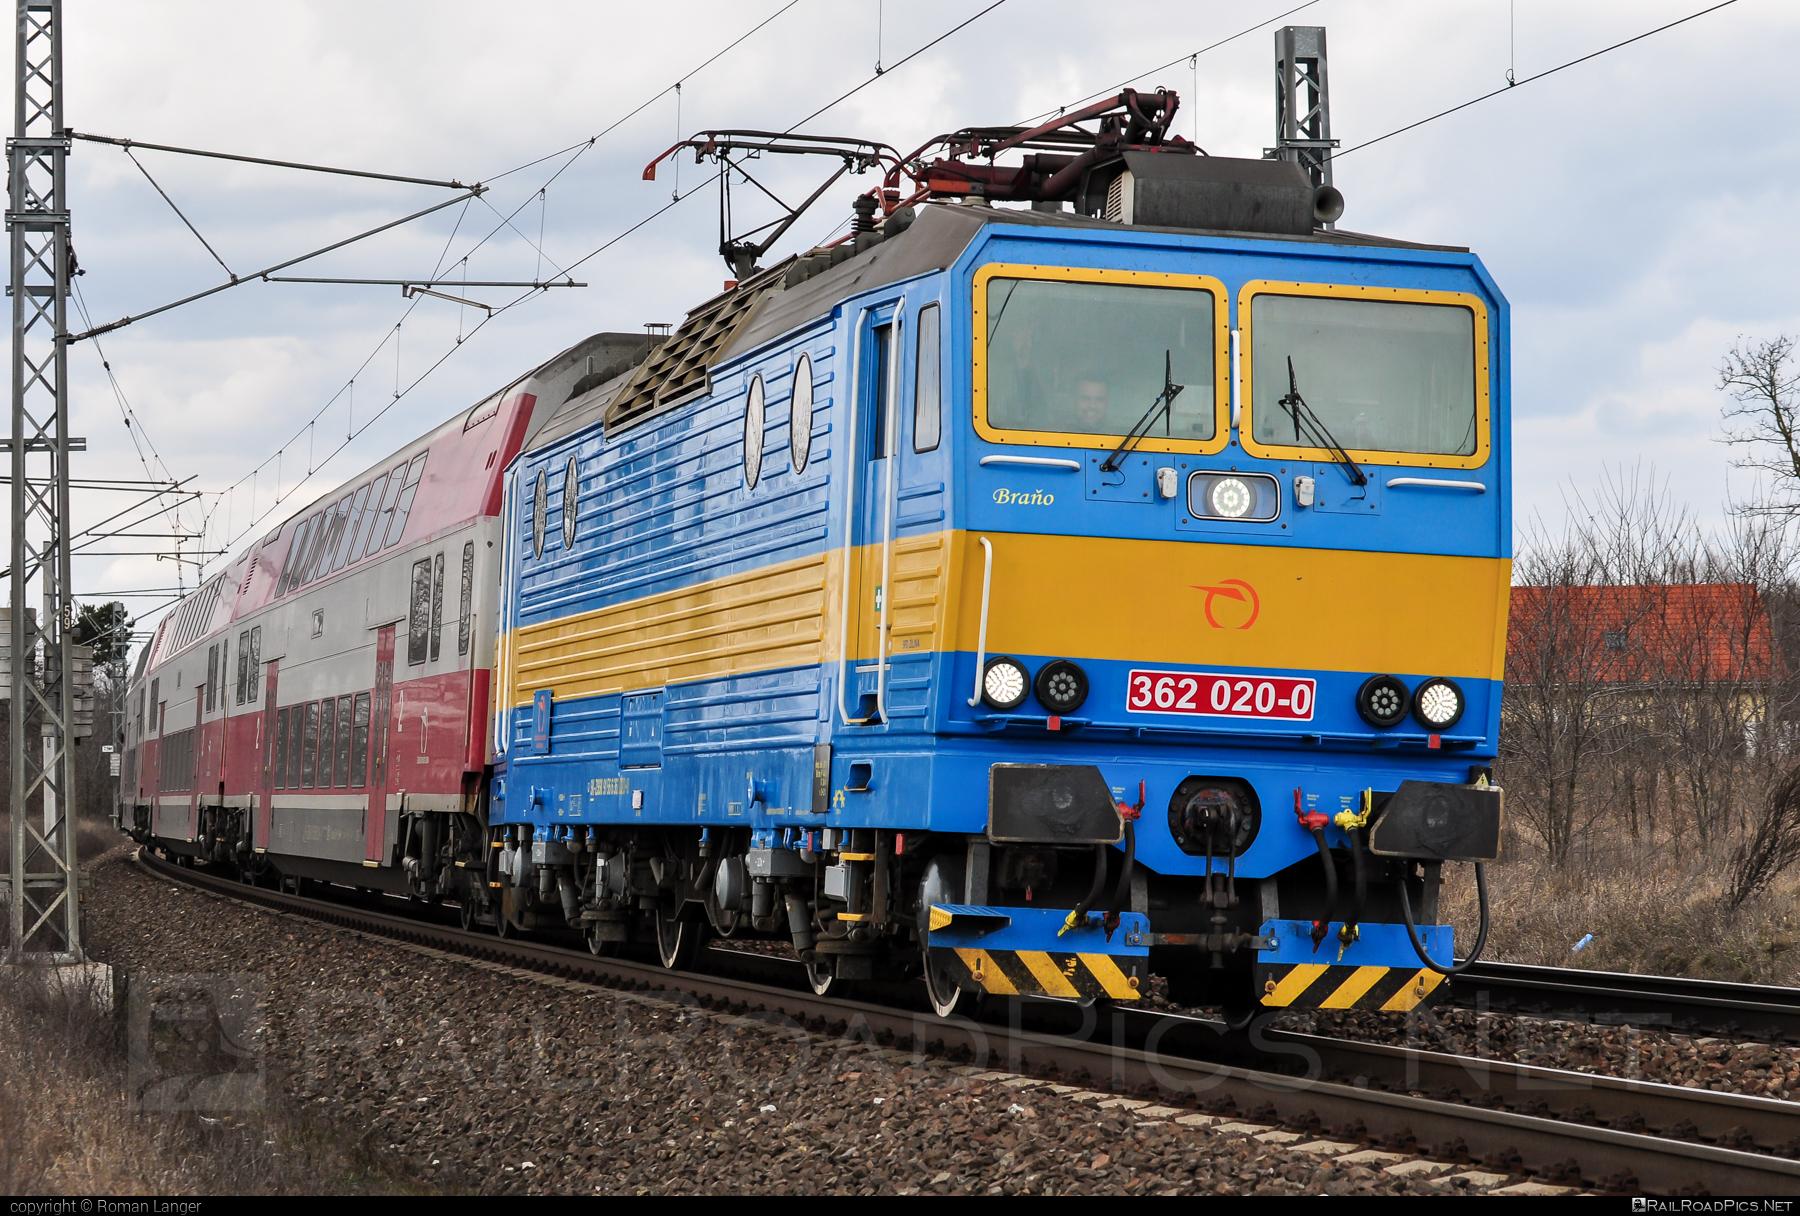 Škoda 69Er - 362 020-0 operated by Železničná Spoločnost' Slovensko, a.s. #ZeleznicnaSpolocnostSlovensko #eso #locomotive362 #rychleeso #skoda #skoda69er #zssk